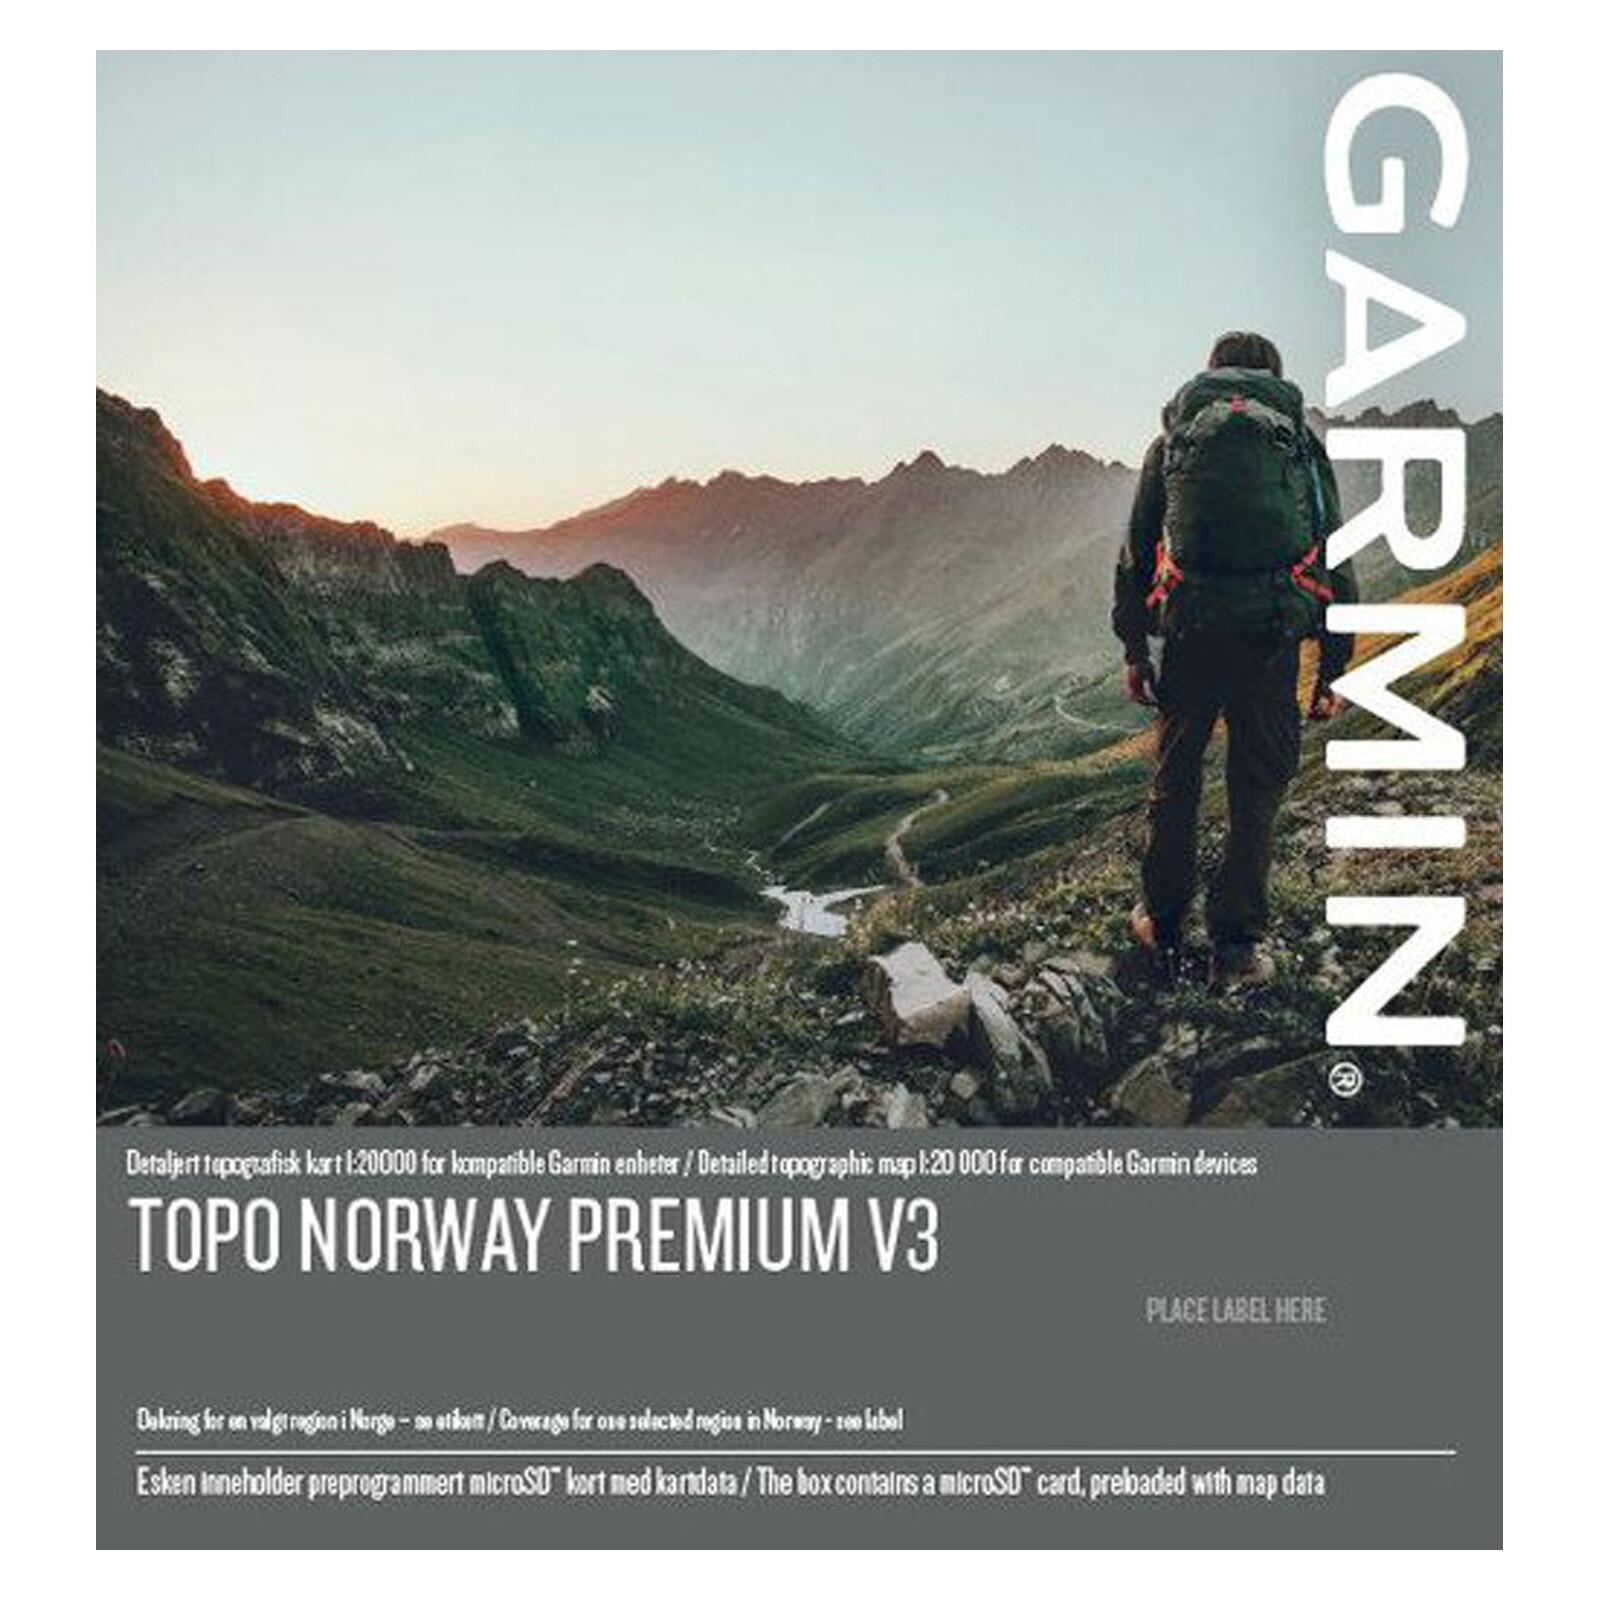 Garmin Topo TOPO Norway Premium v3, 7 Nordland Sor mSD/SD